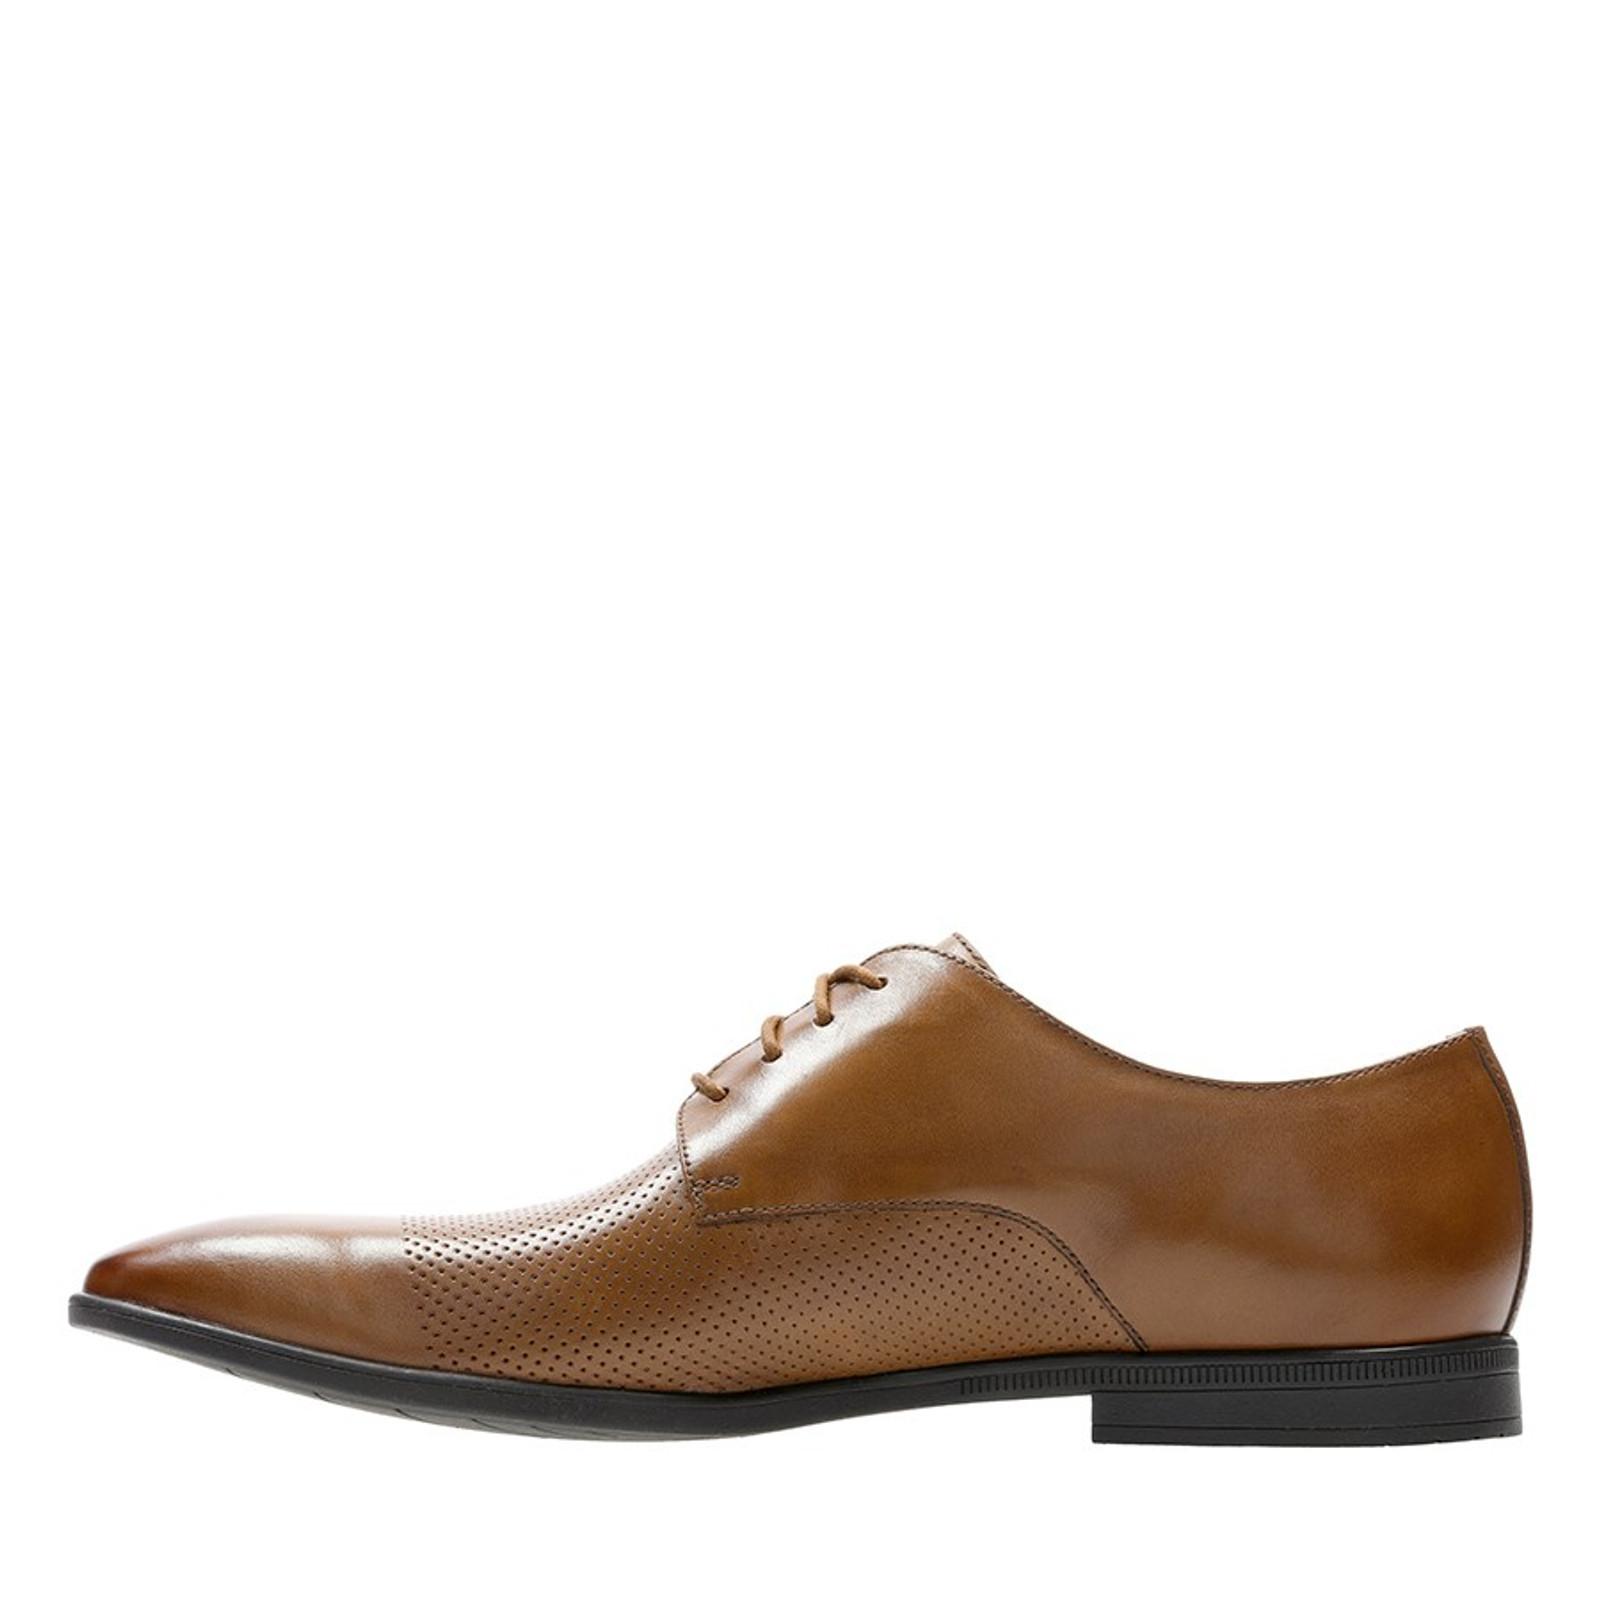 Clarks Mens BAMPTON CAP Tan Leather